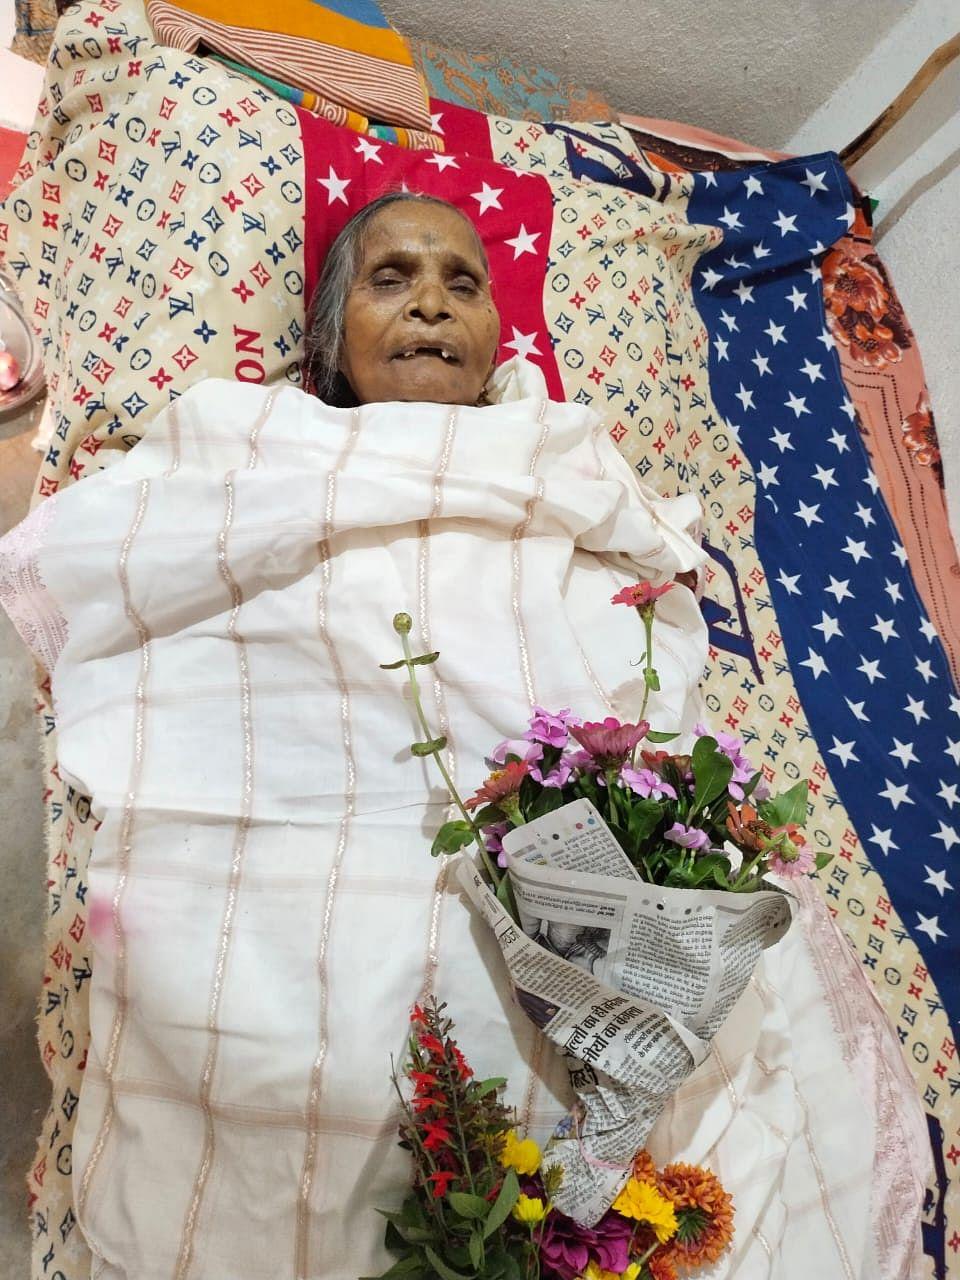 balmdina-ekka-wife-of-param-vir-chakra-winner-albert-ekka-dies